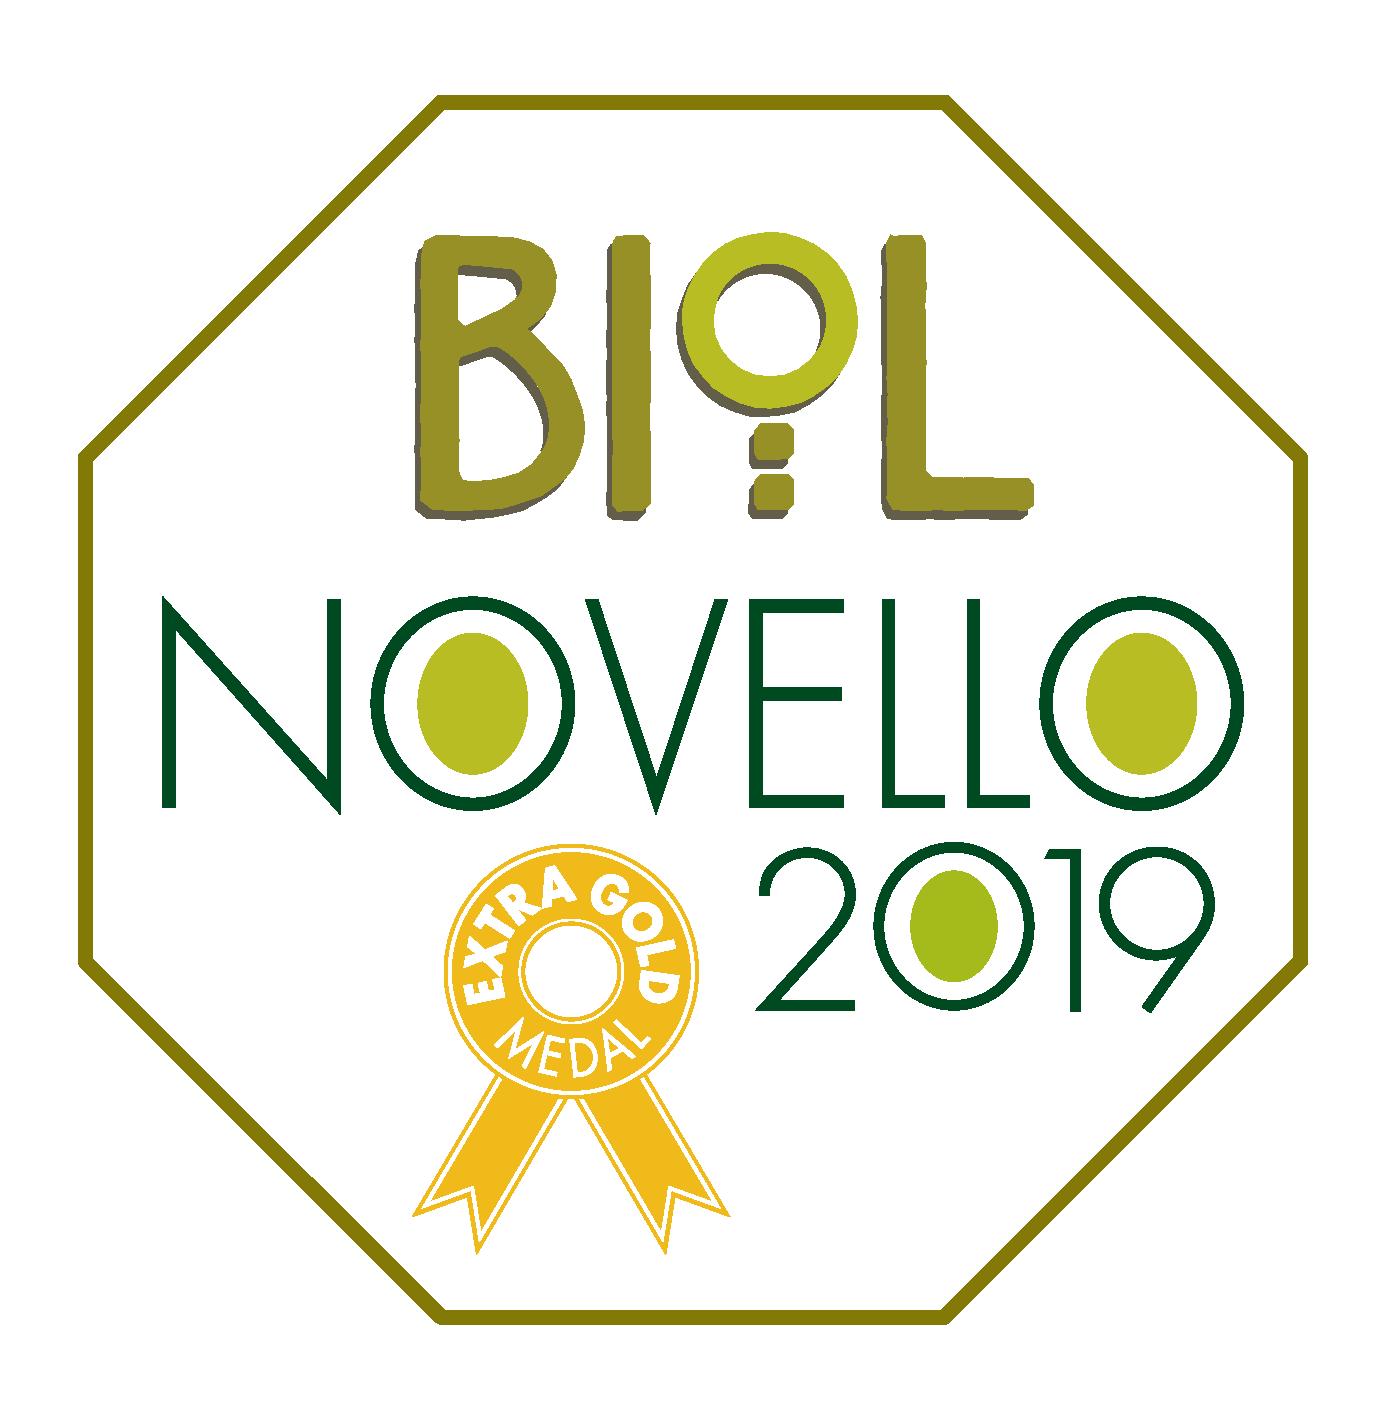 Biolnovello 2019 - Curtimaggi